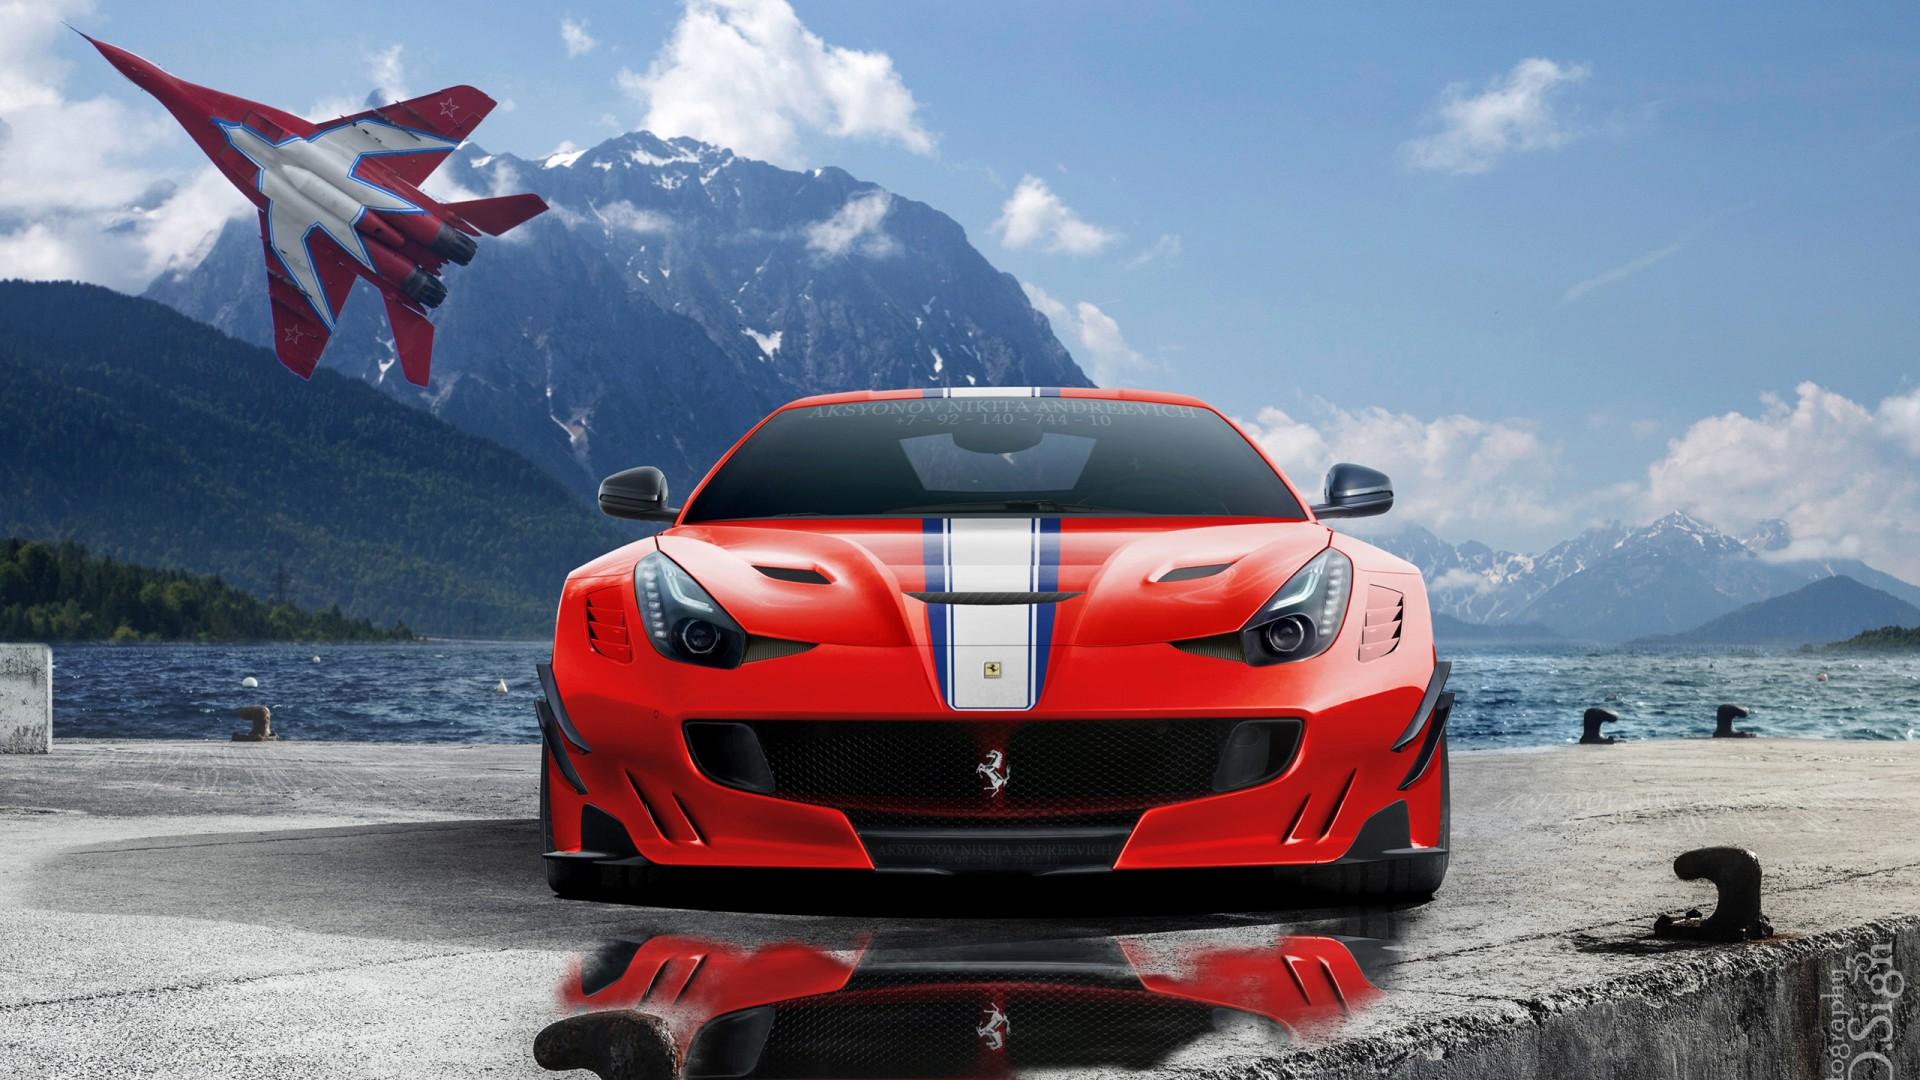 F12 ferrari f12tdf speciale wallpaper hd car wallpapers - Cars hd wallpapers for laptop ...